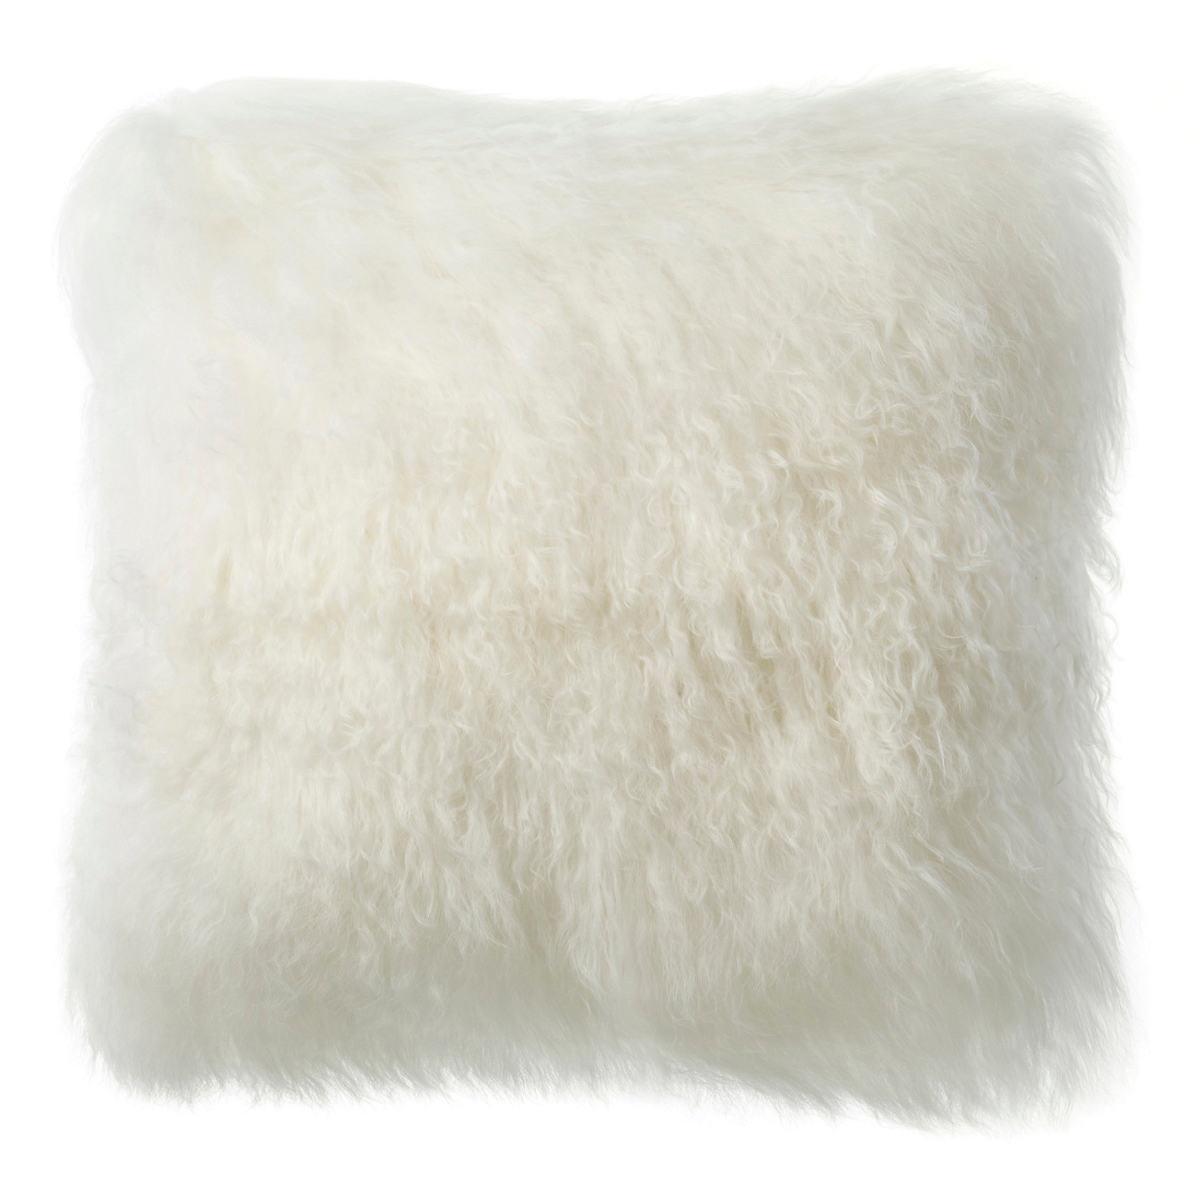 Ivory Longwool Tibetan Sheepskin Decorative Pillow